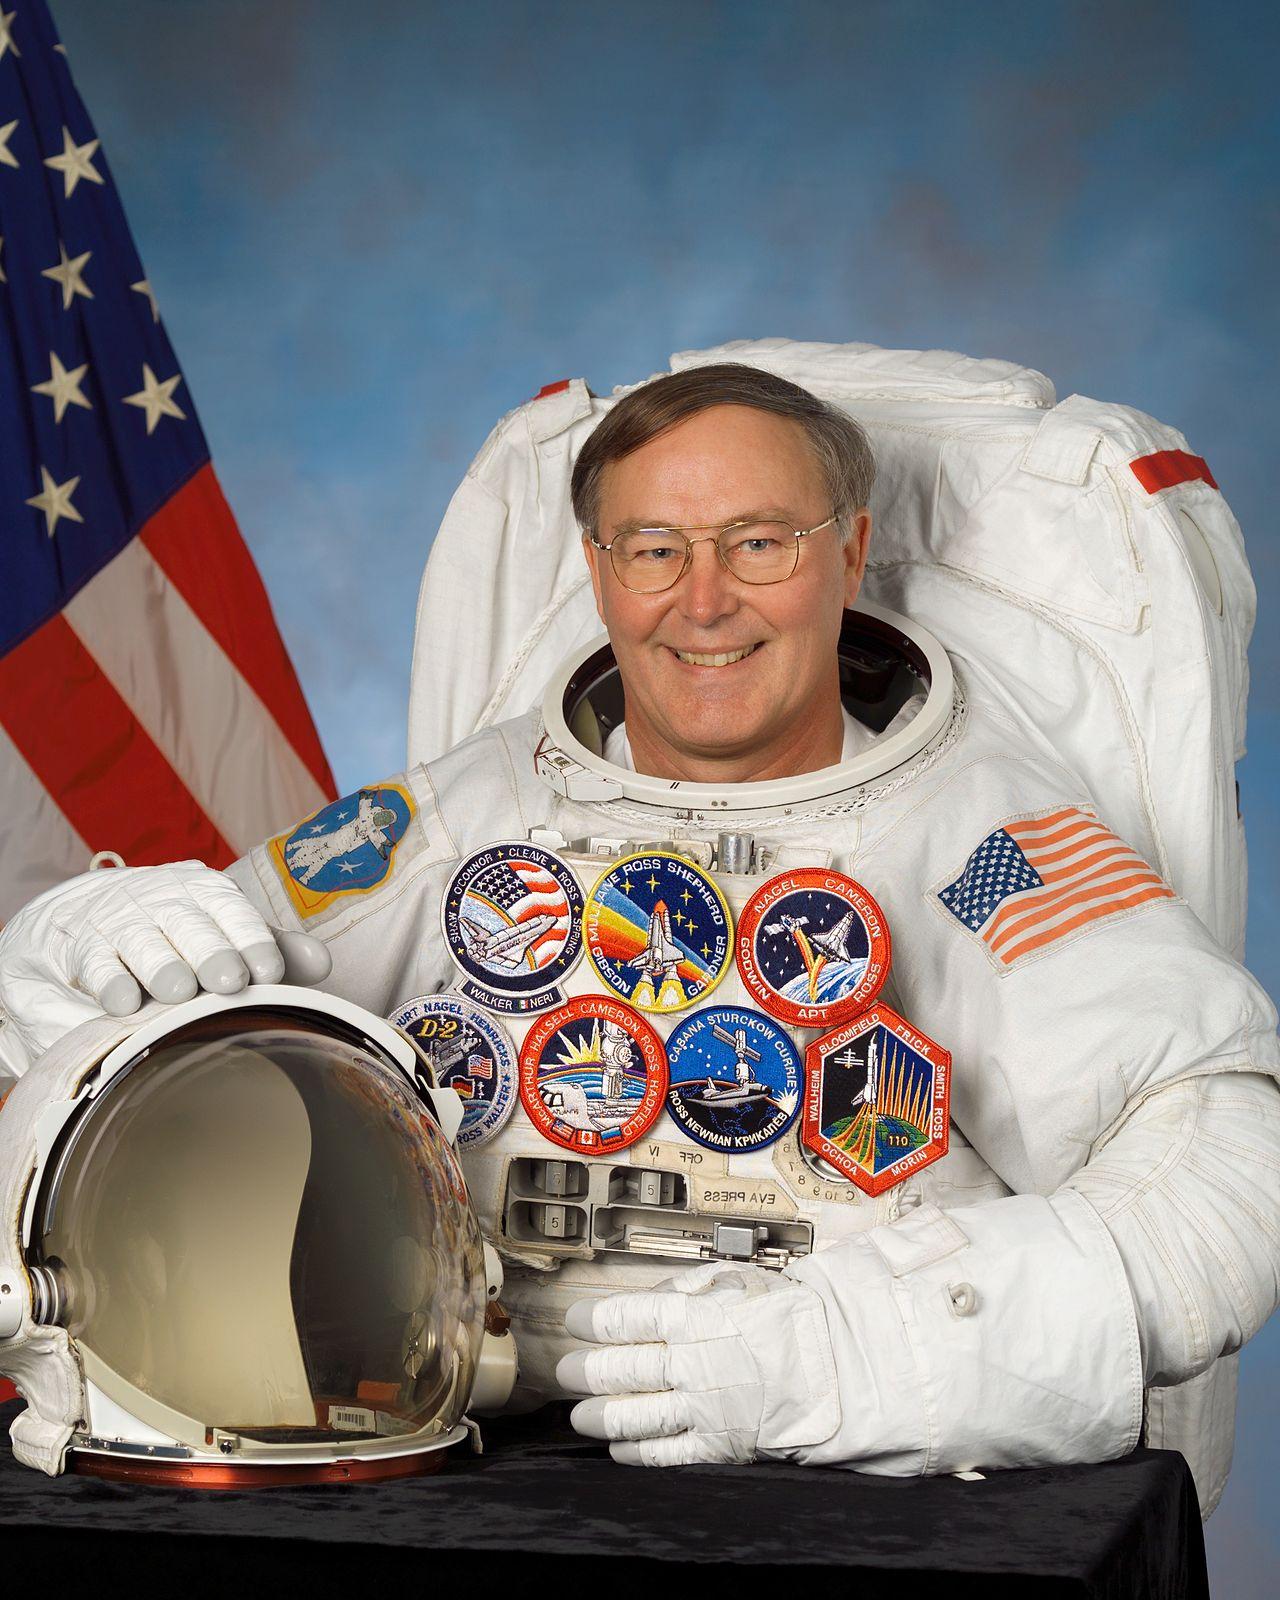 Jerry Ross NASA Astronaut